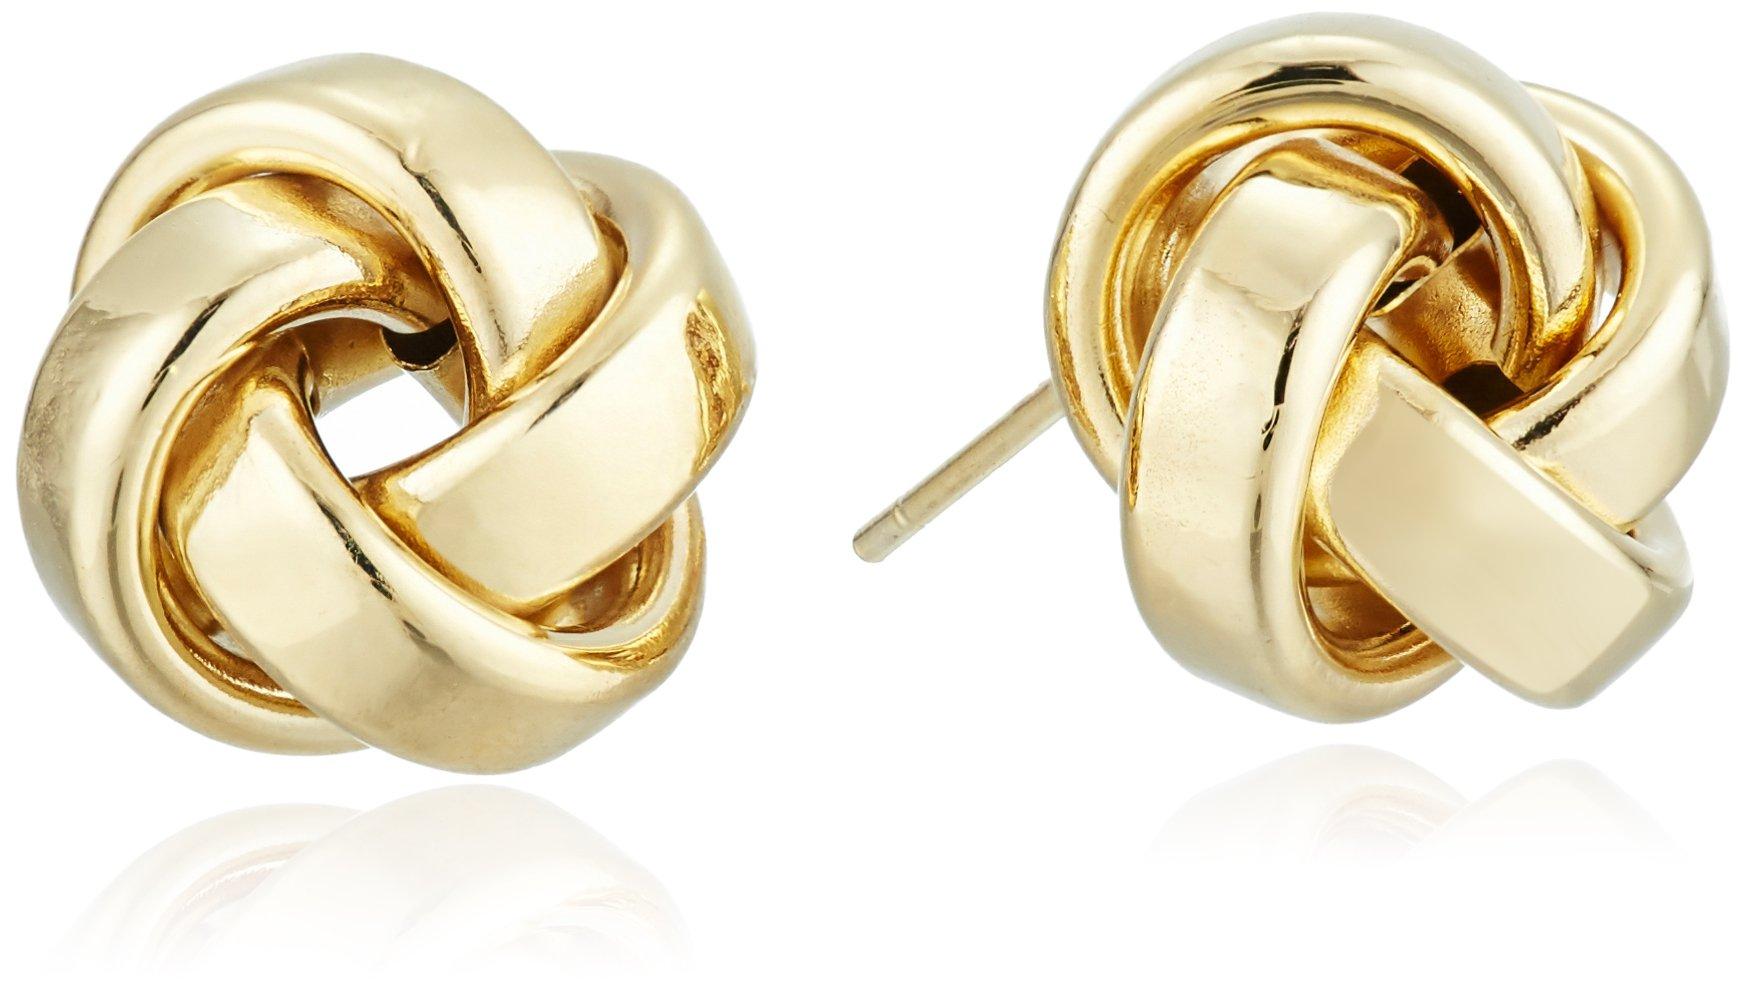 14k Yellow Gold Italian High Polished Love Knot Stud Earrings